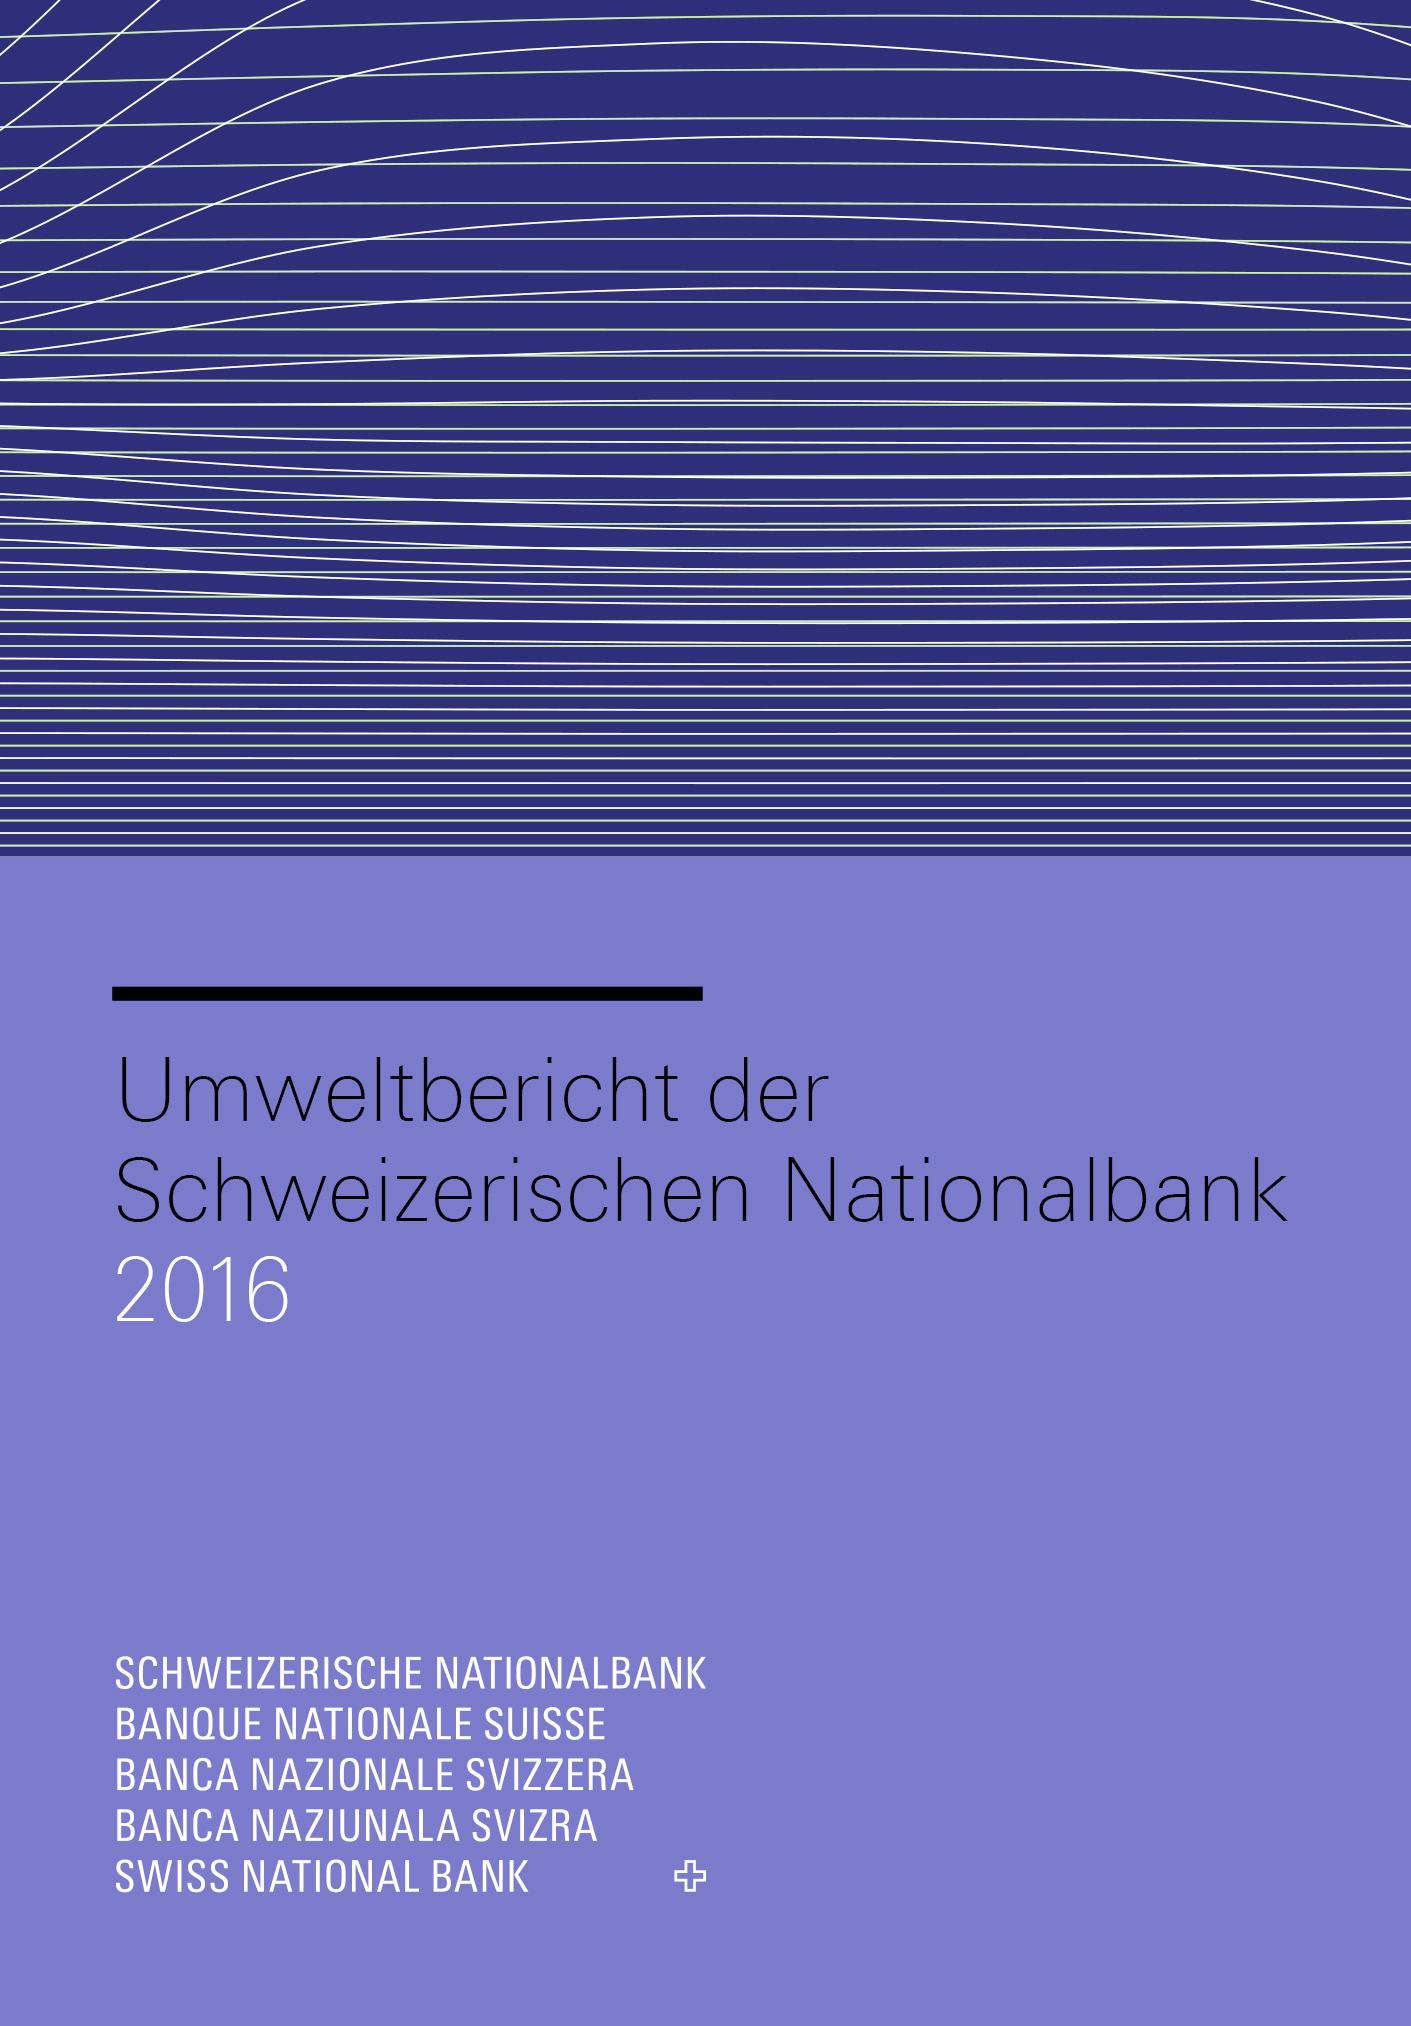 SNB - Umweltbericht